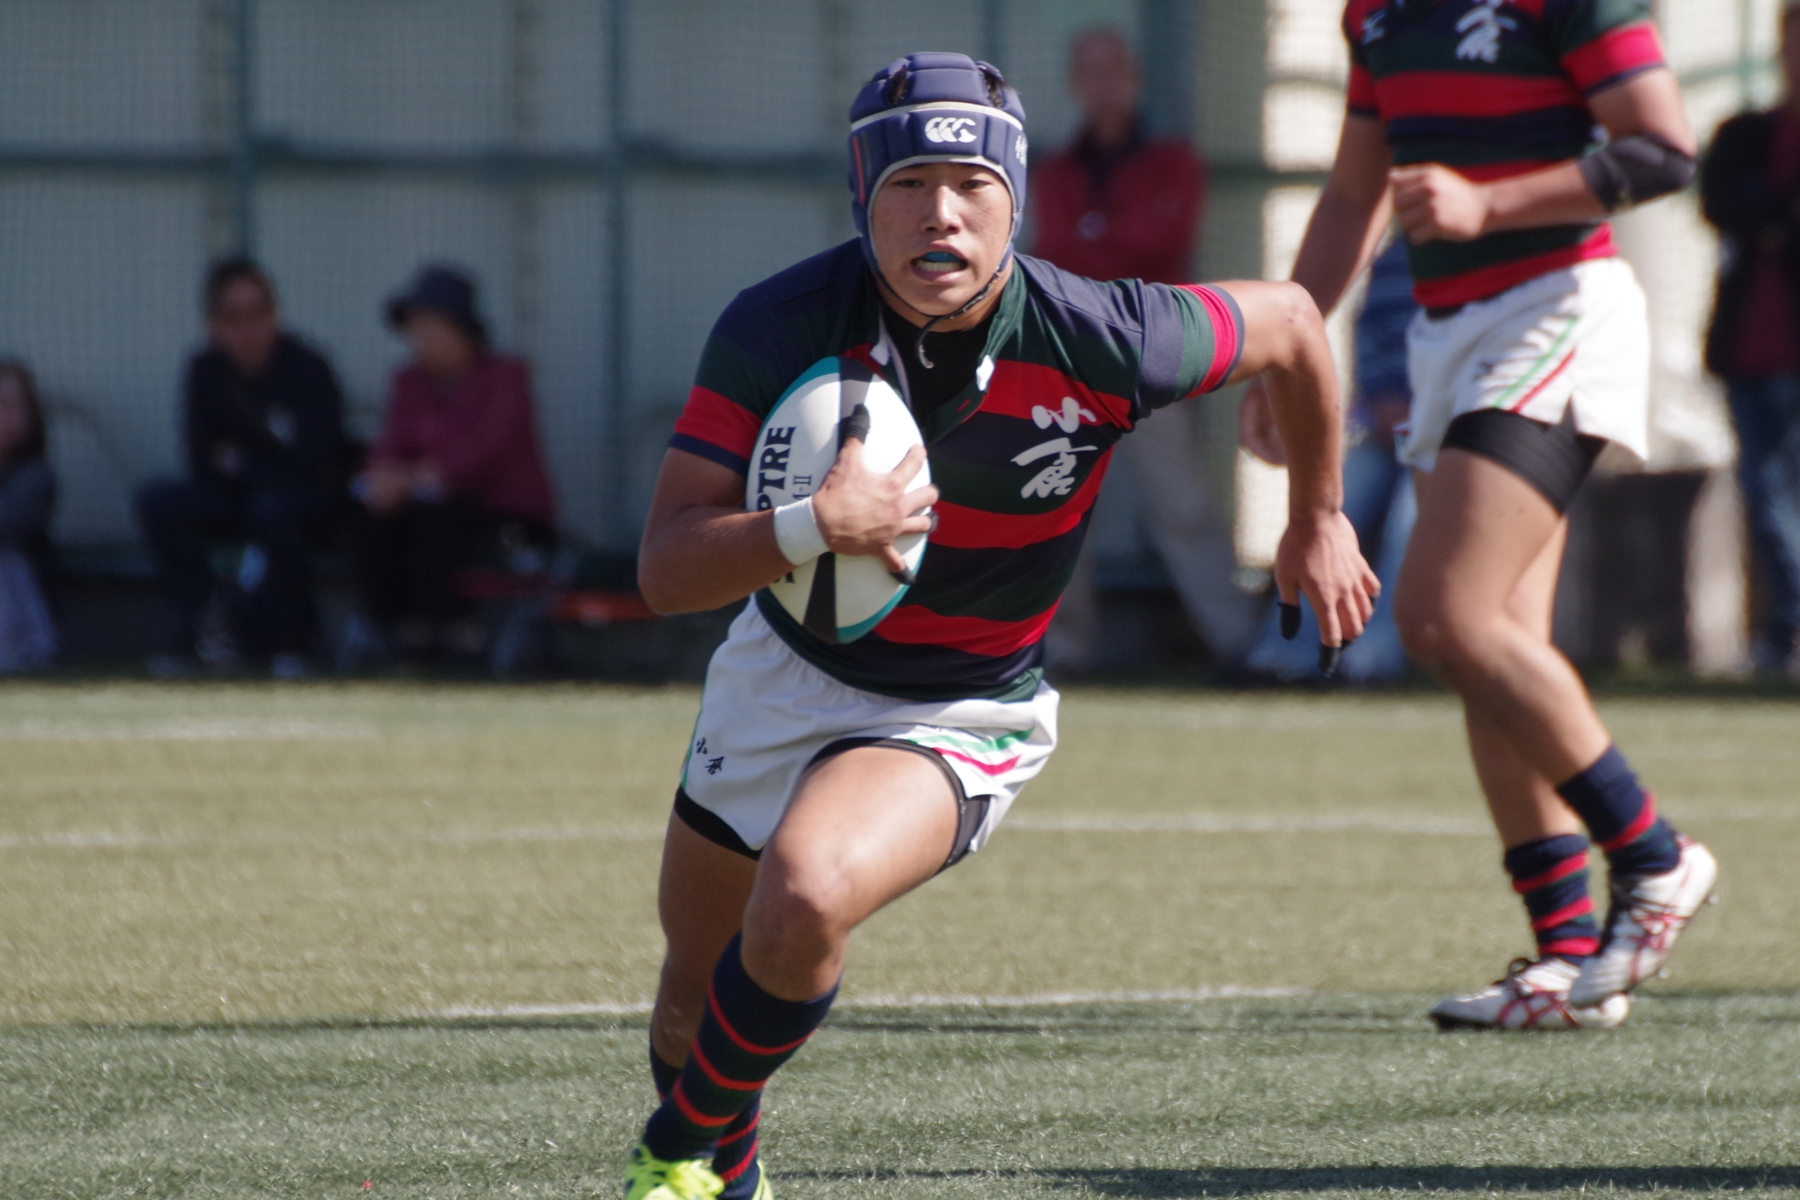 http://kokura-rugby.sakura.ne.jp/181021_130912_0914.jpg